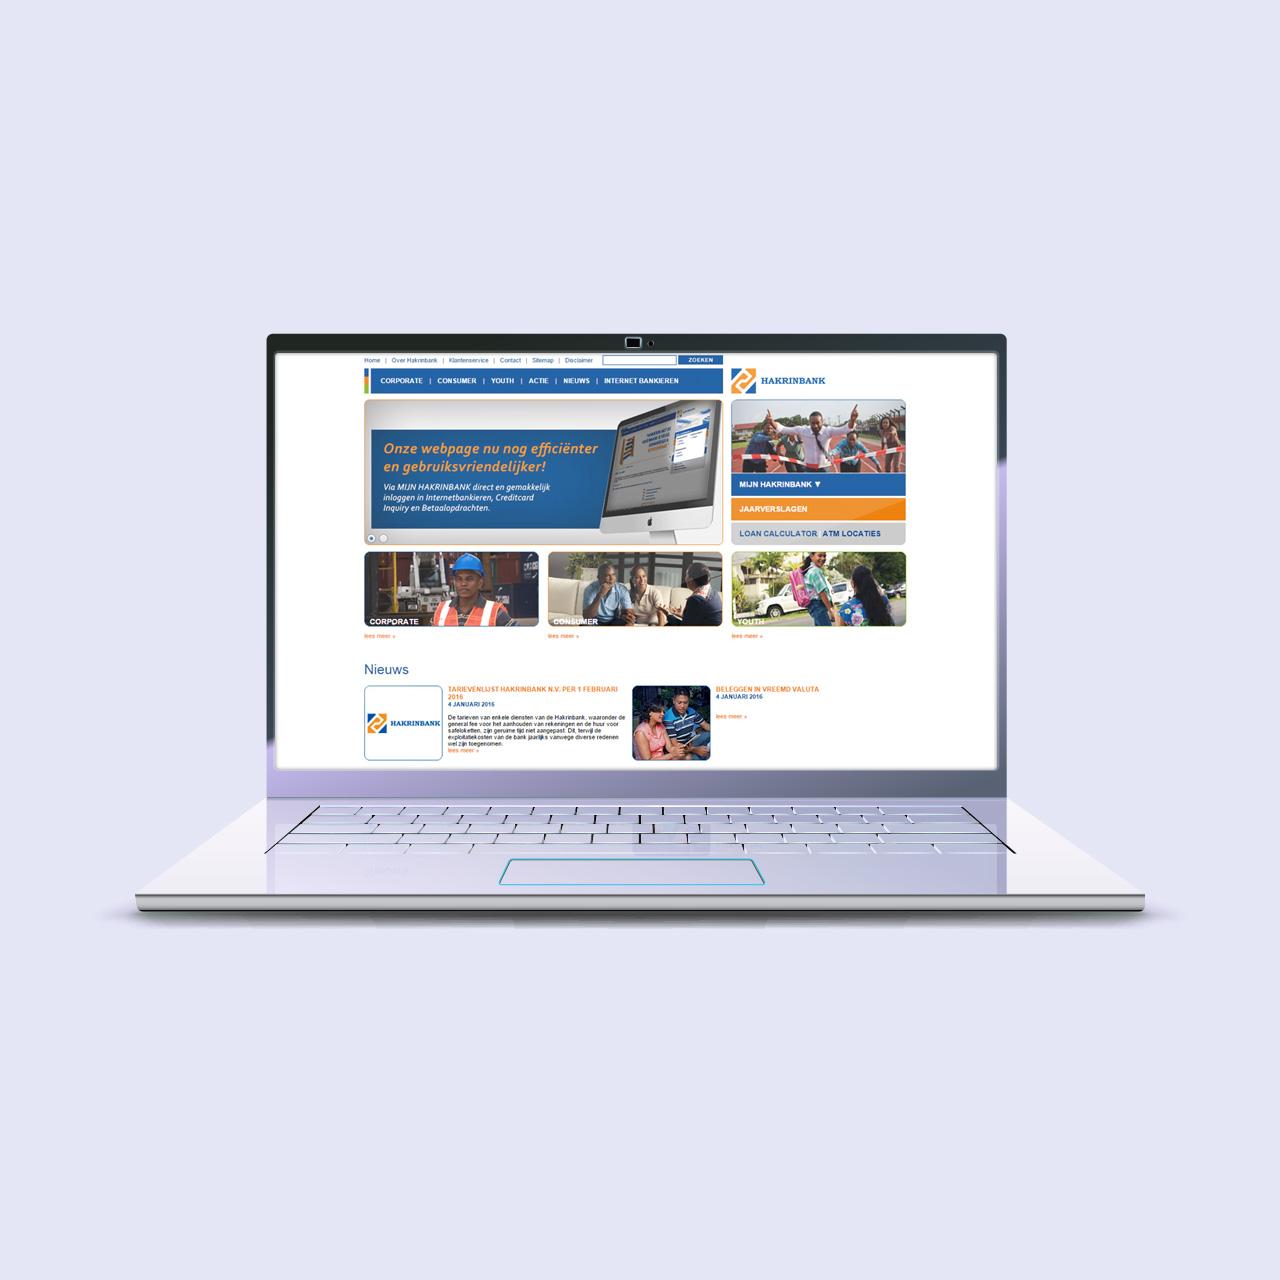 hakrinbank website